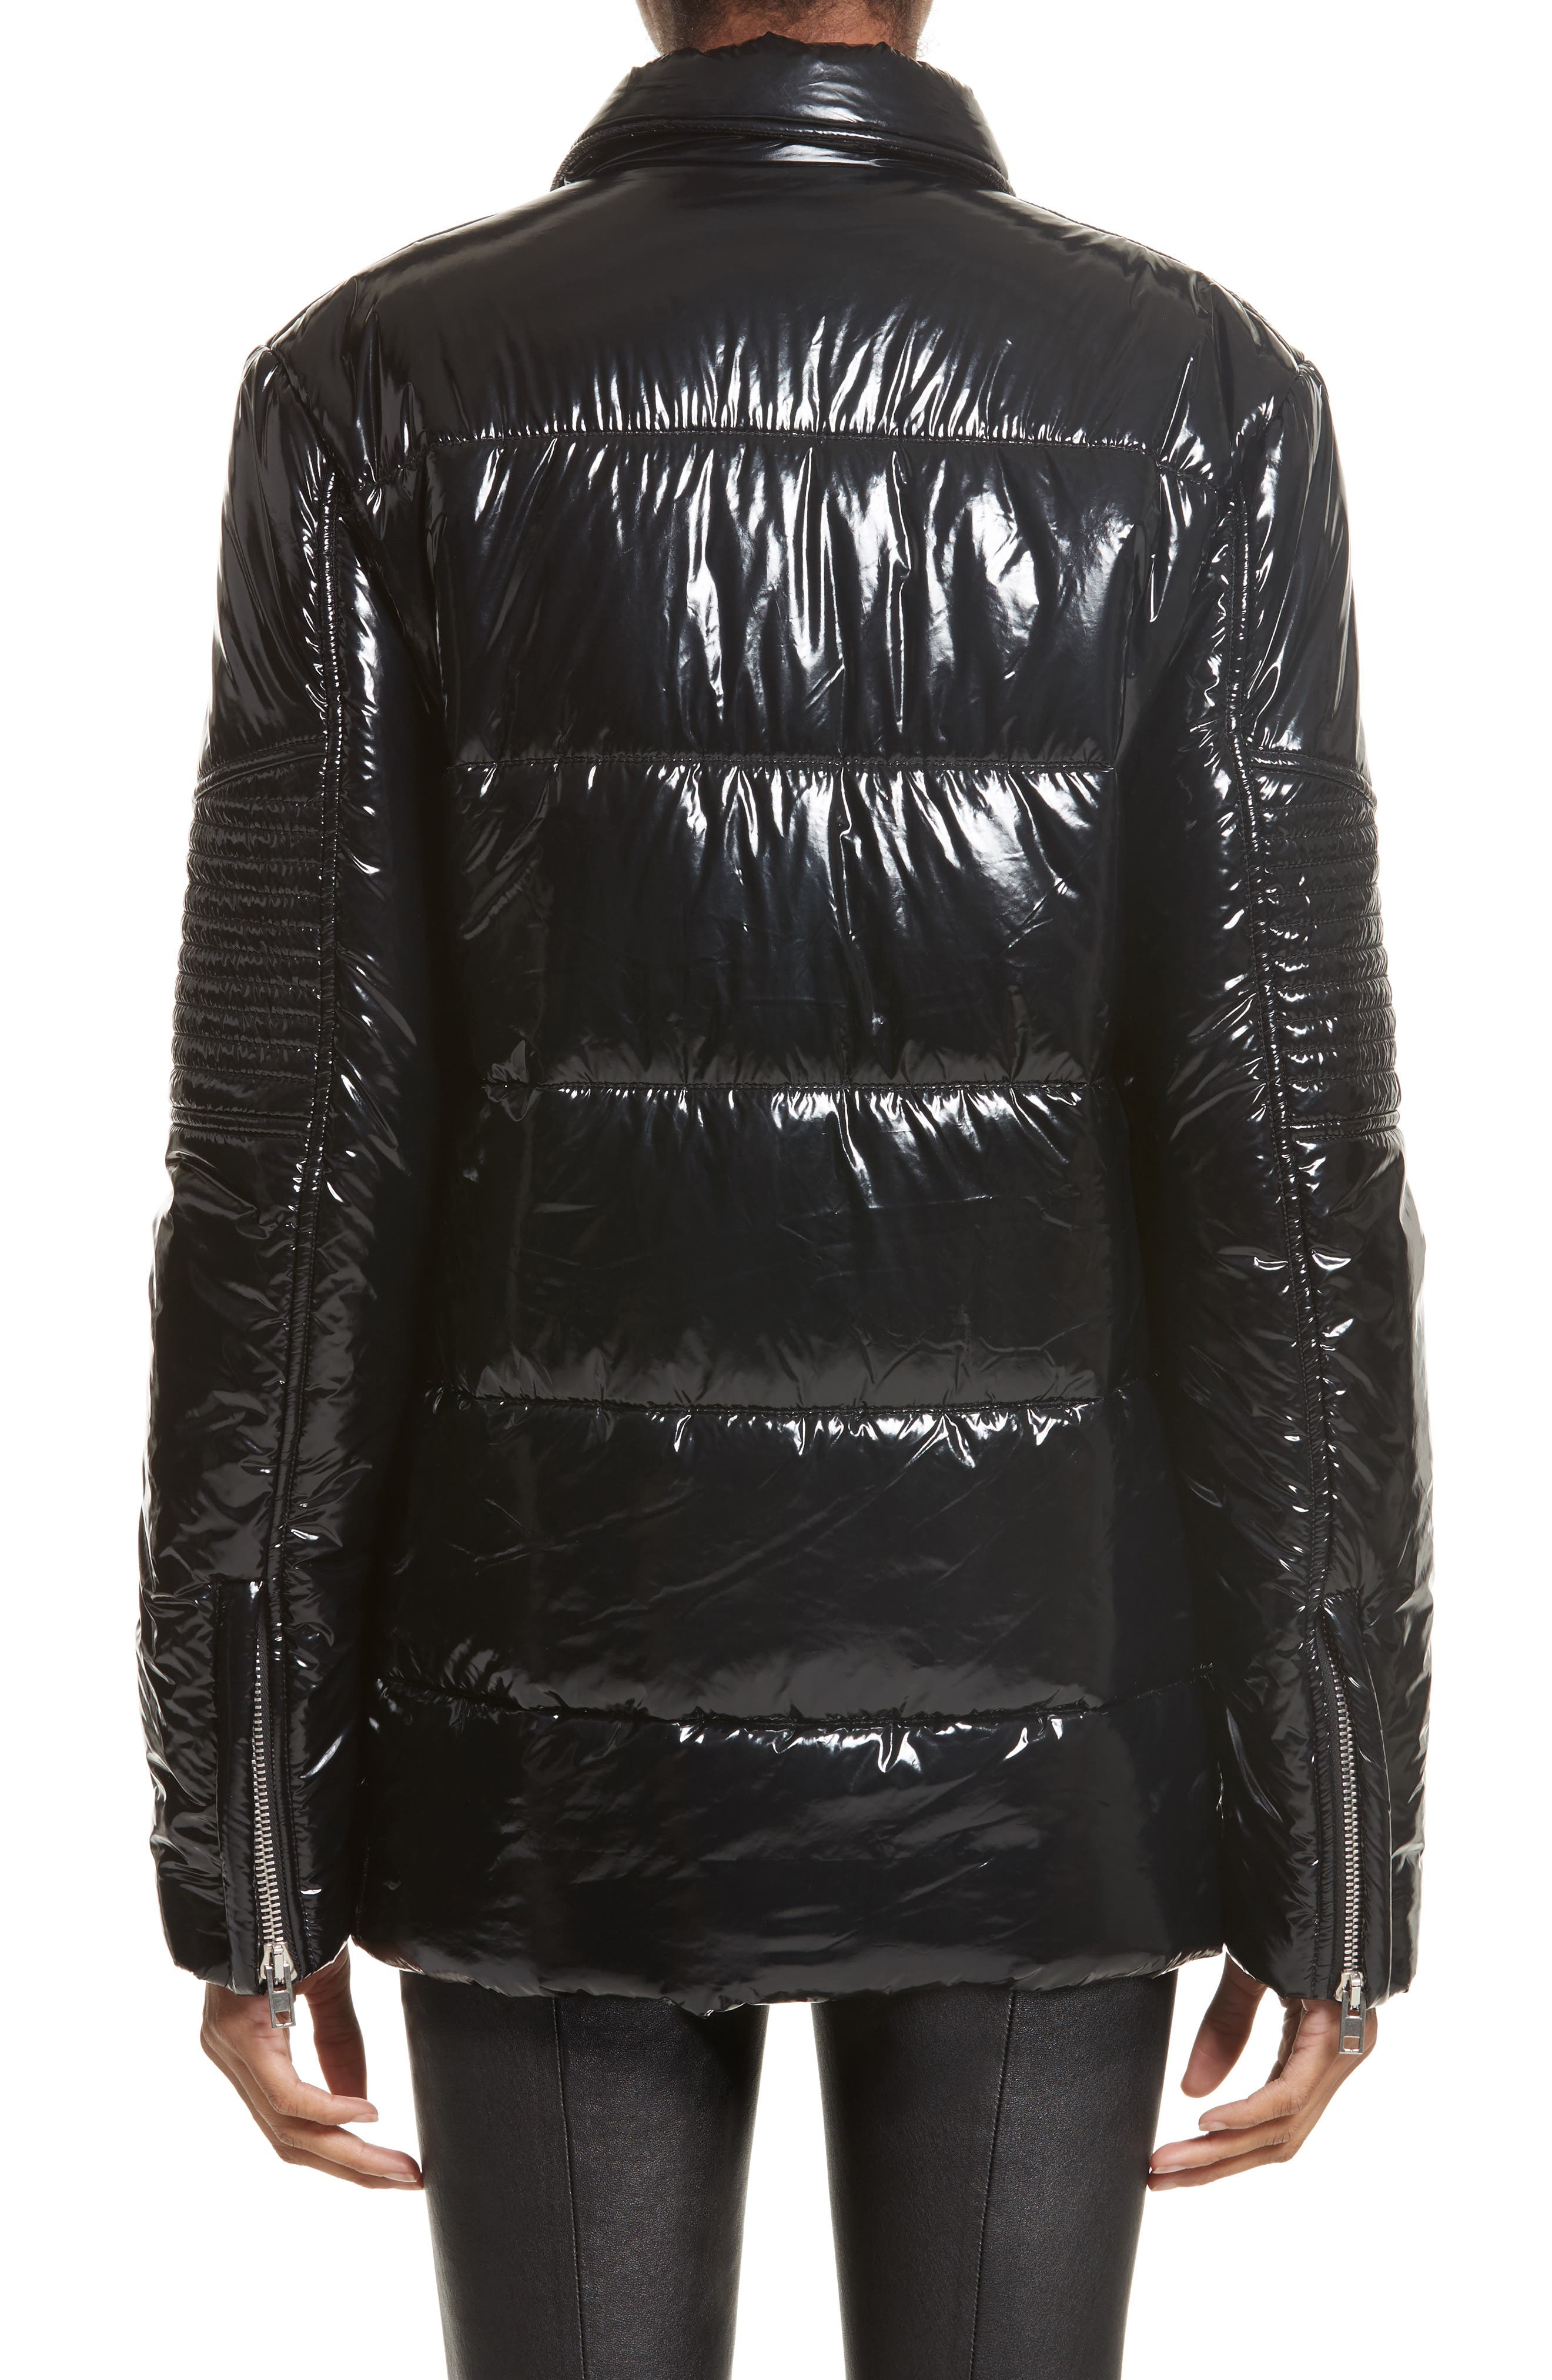 Moto Puffer Jacket,                             Alternate thumbnail 2, color,                             Black/ Black